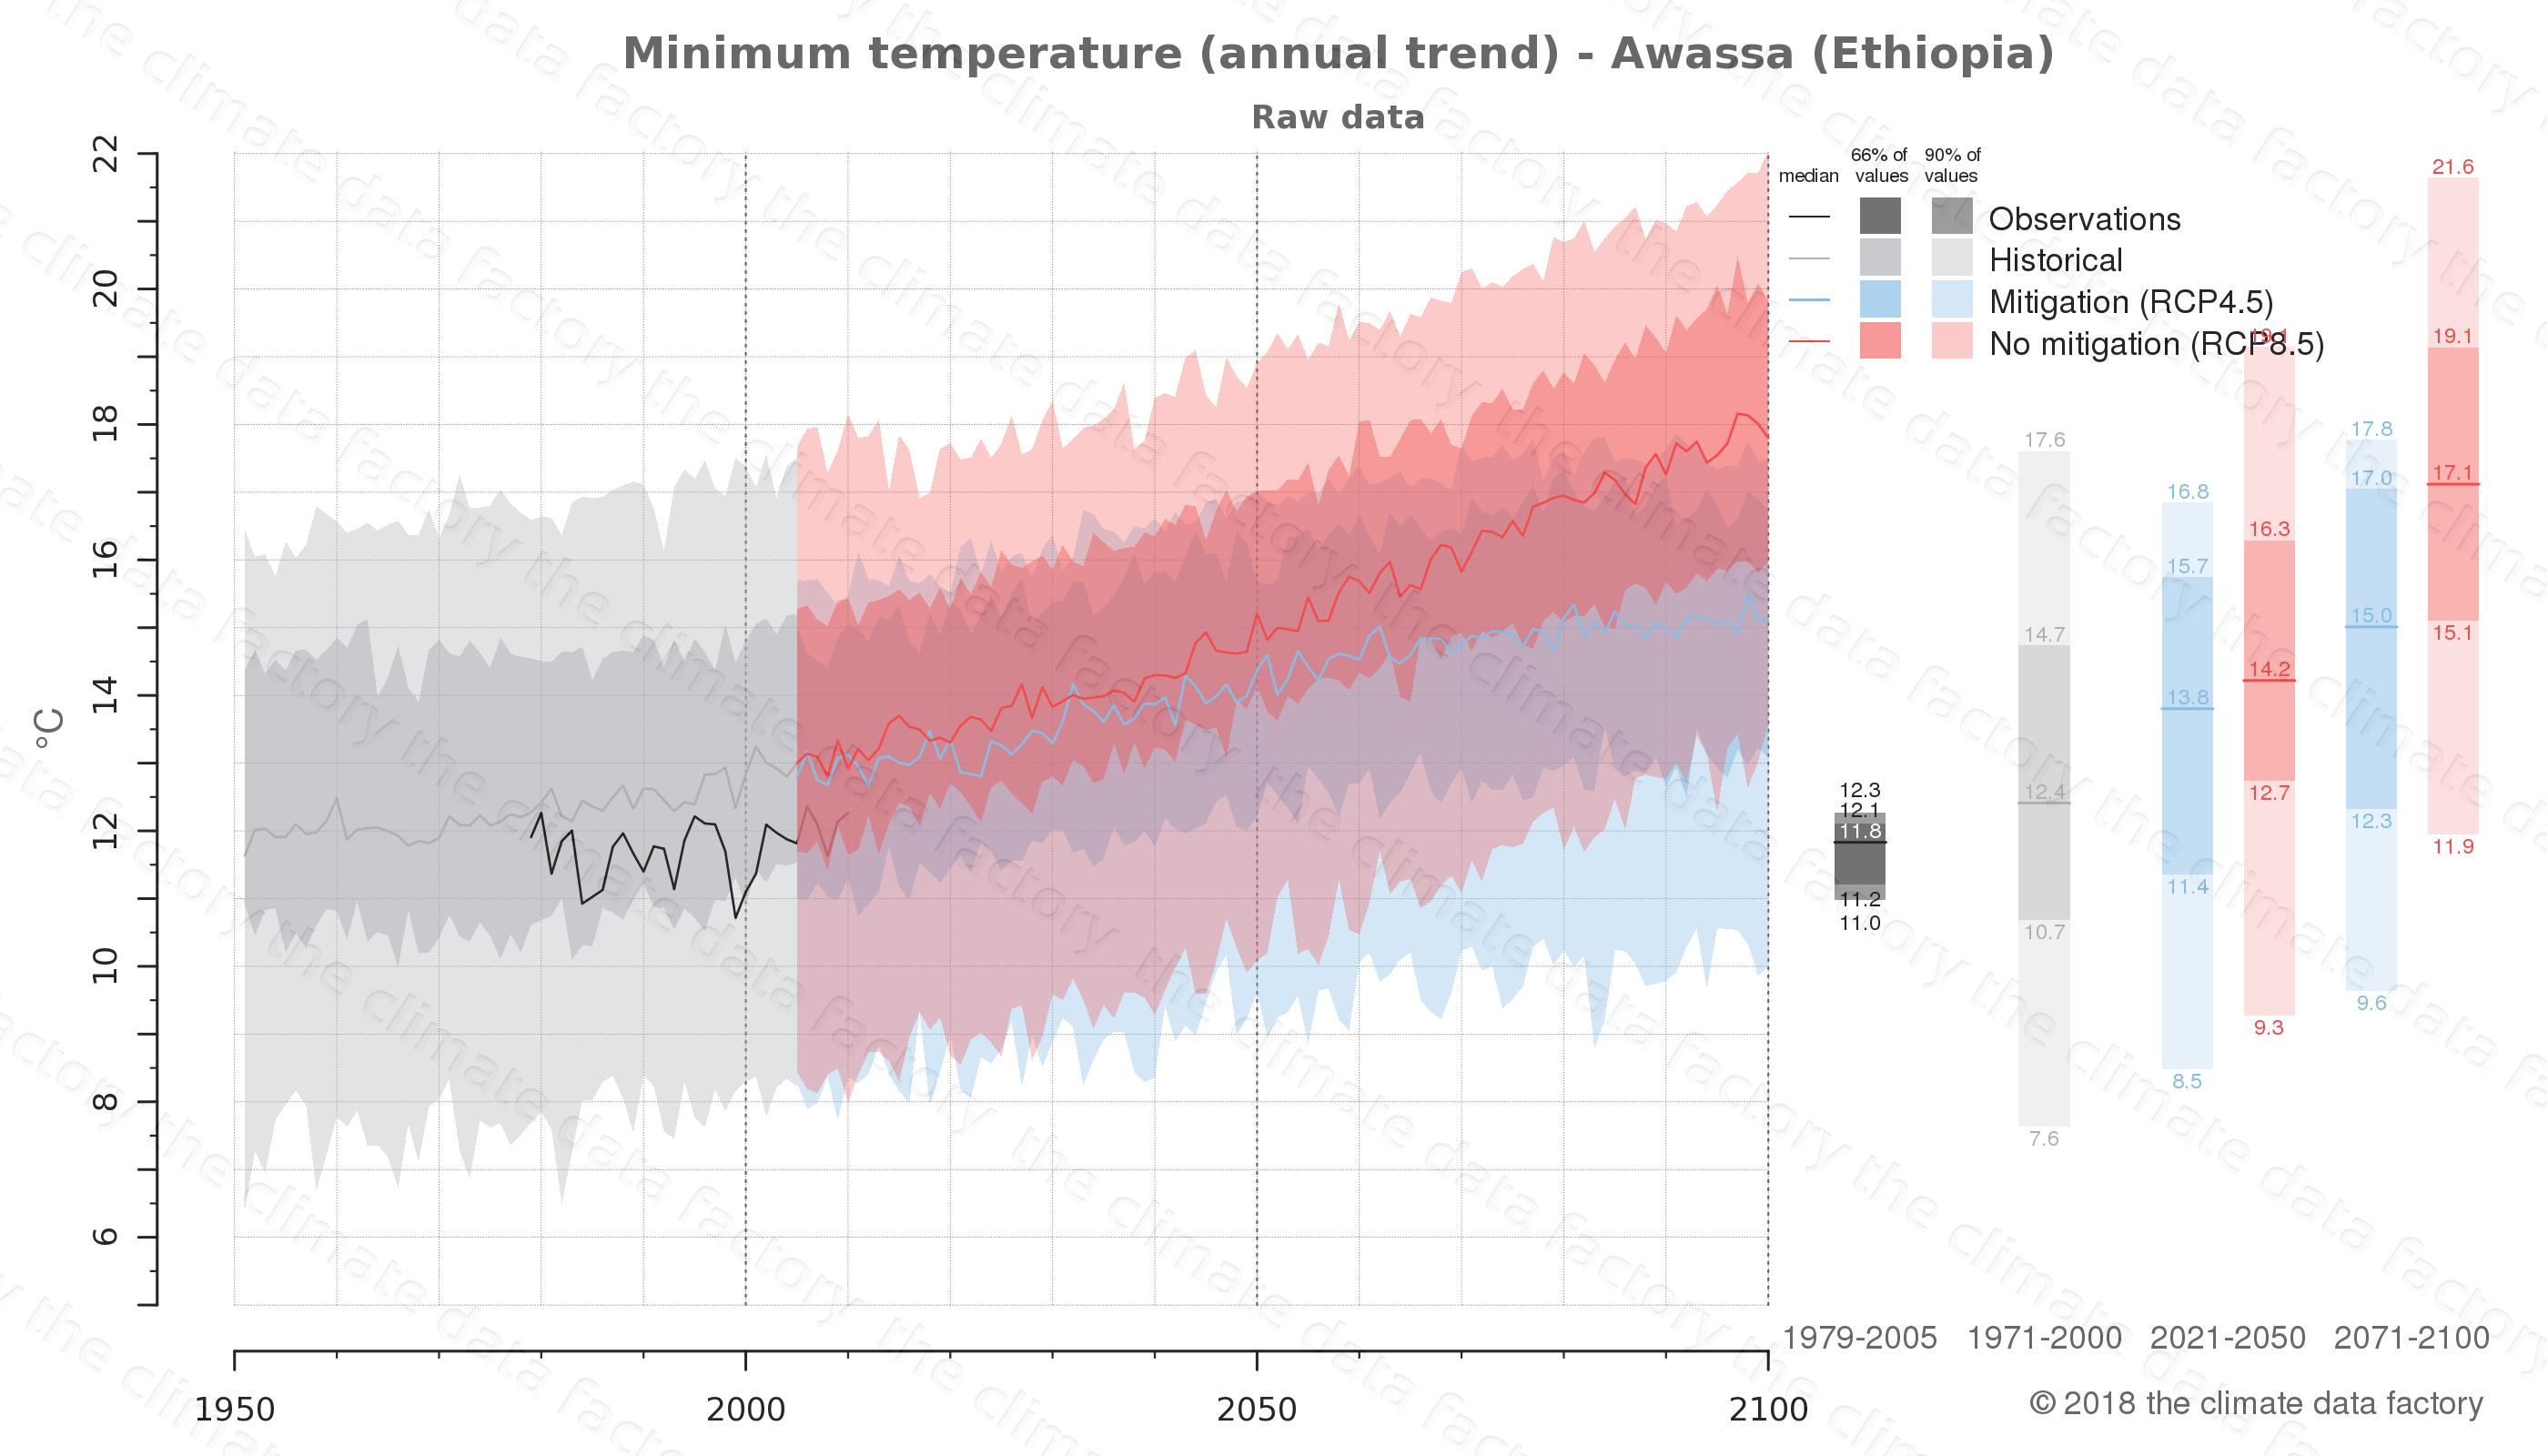 climate change data policy adaptation climate graph city data minimum-temperature awassa ethiopia